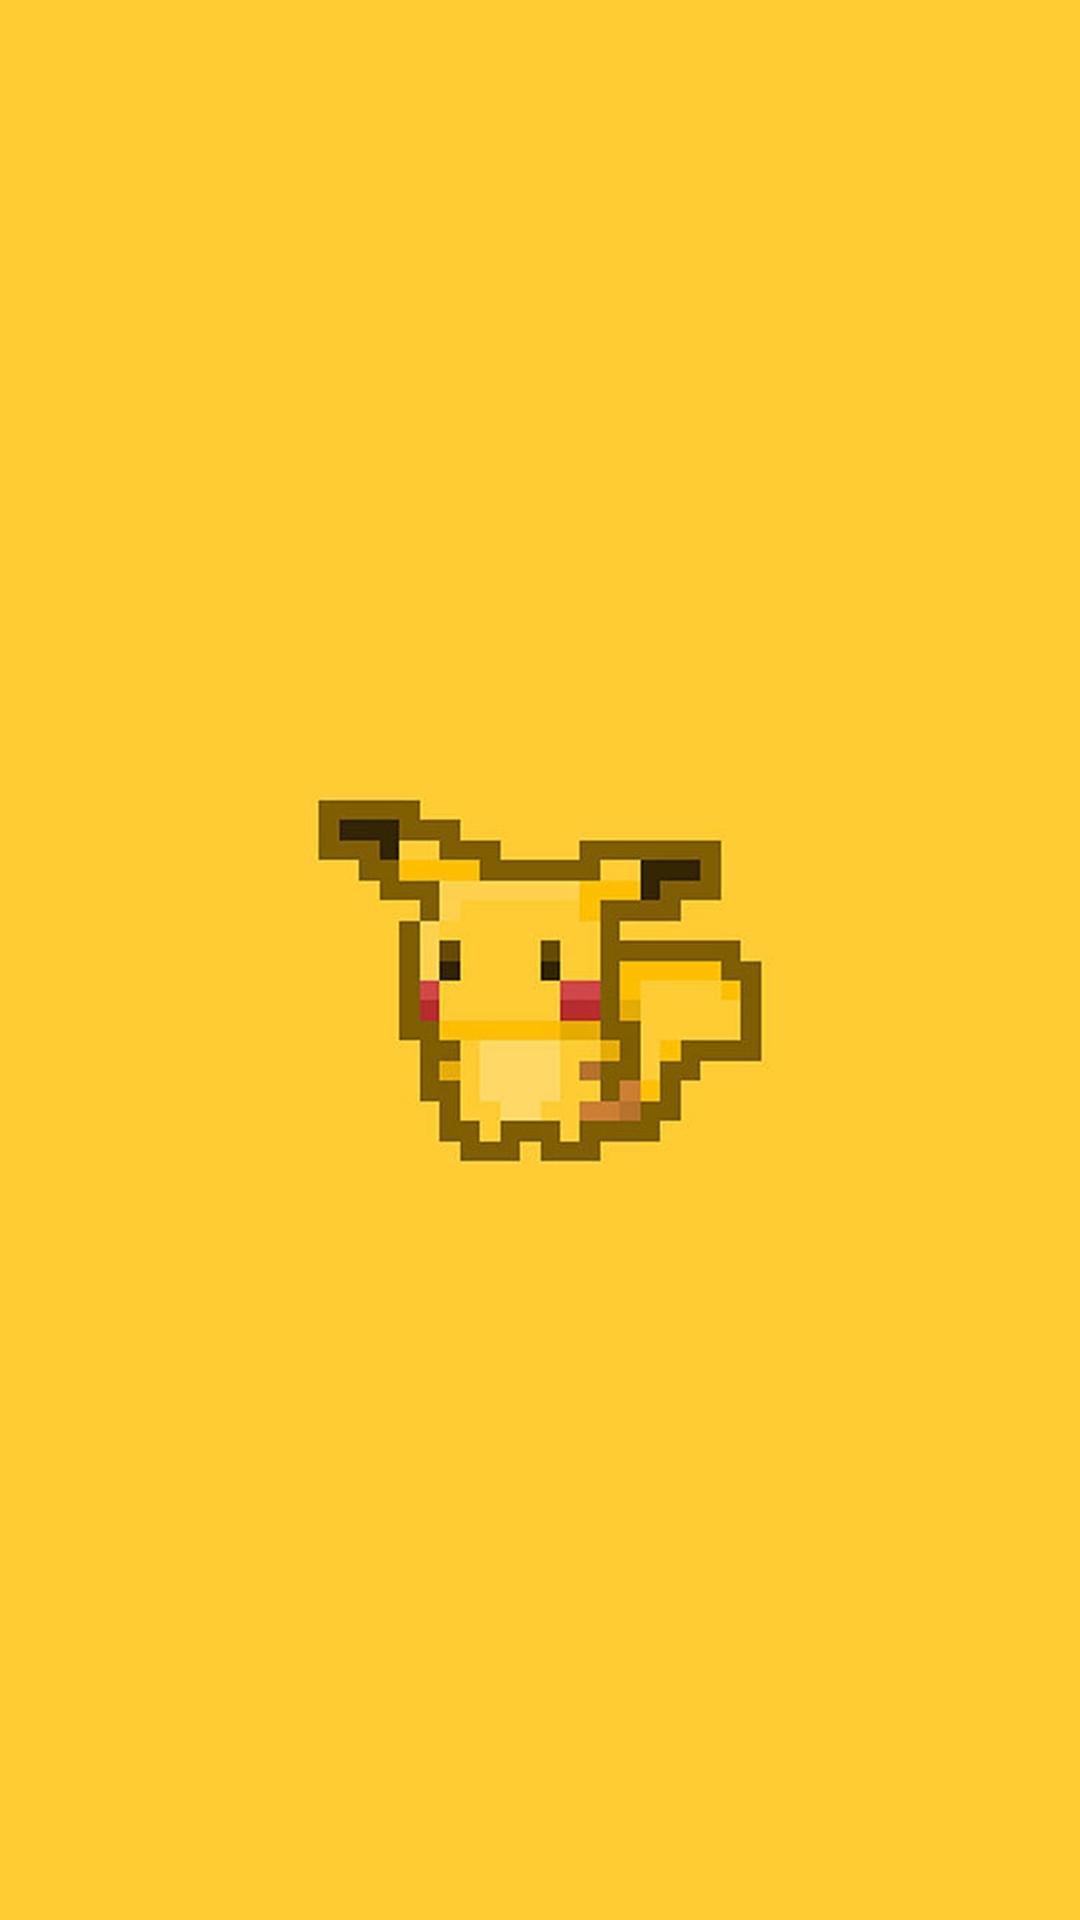 Pikachu Pokemon Pixel Art iPhone 8 wallpaper